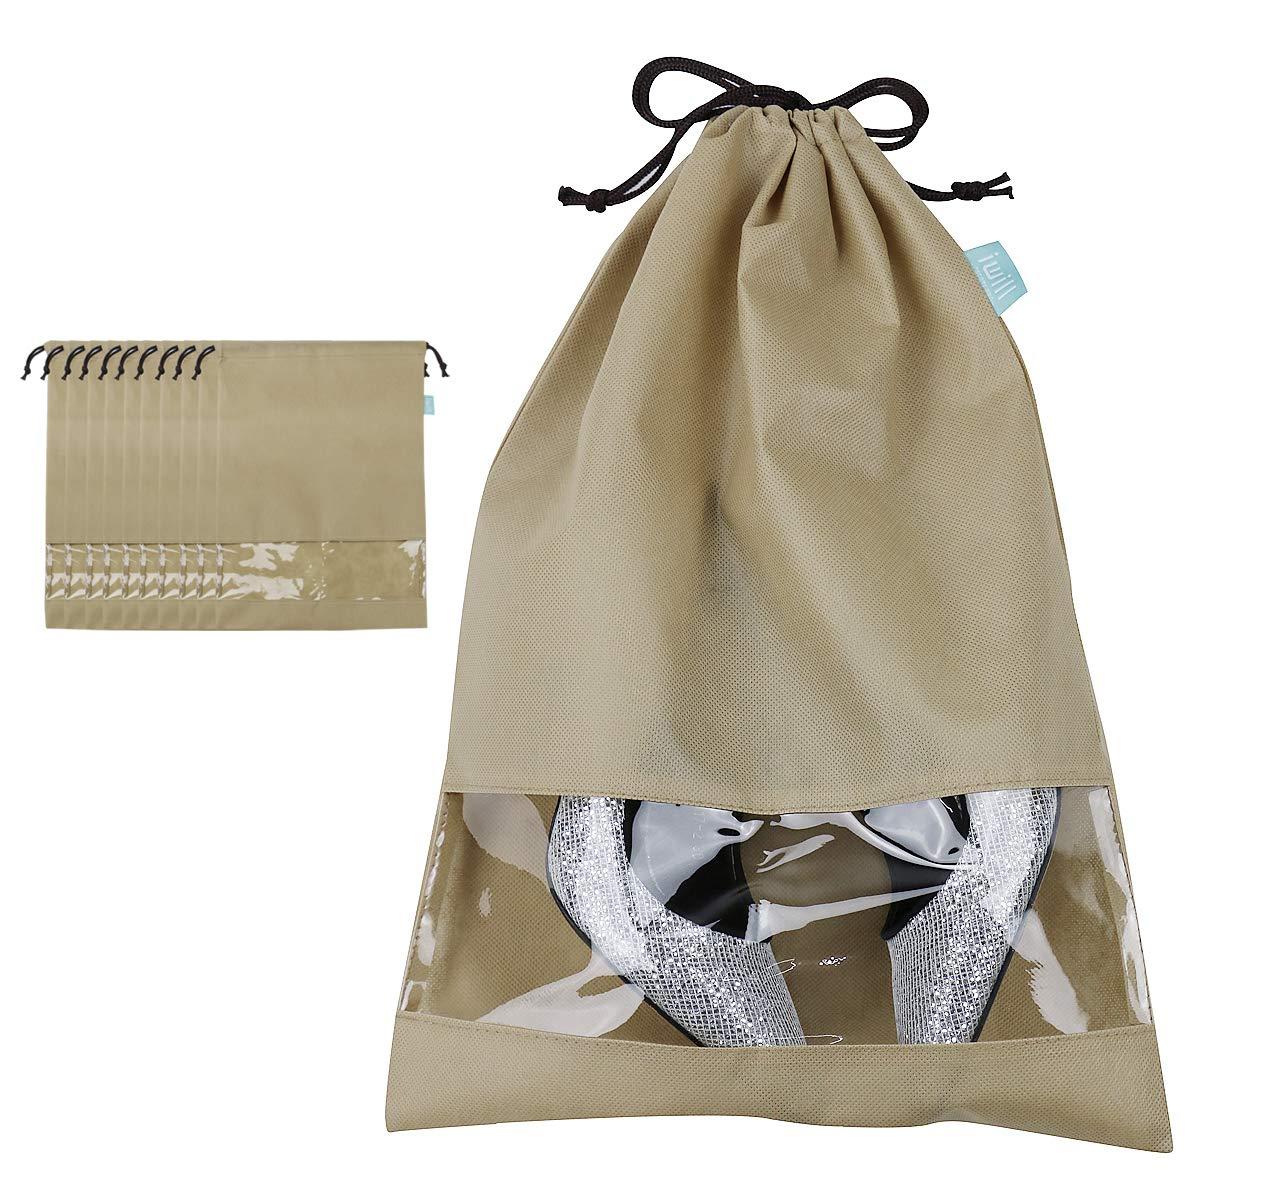 iwill CREATE PRO Shoe Storage Organizer Bags for Shoe Closet, Travel Shoe Storage Pouch for Trip, Khaki, 10pcs